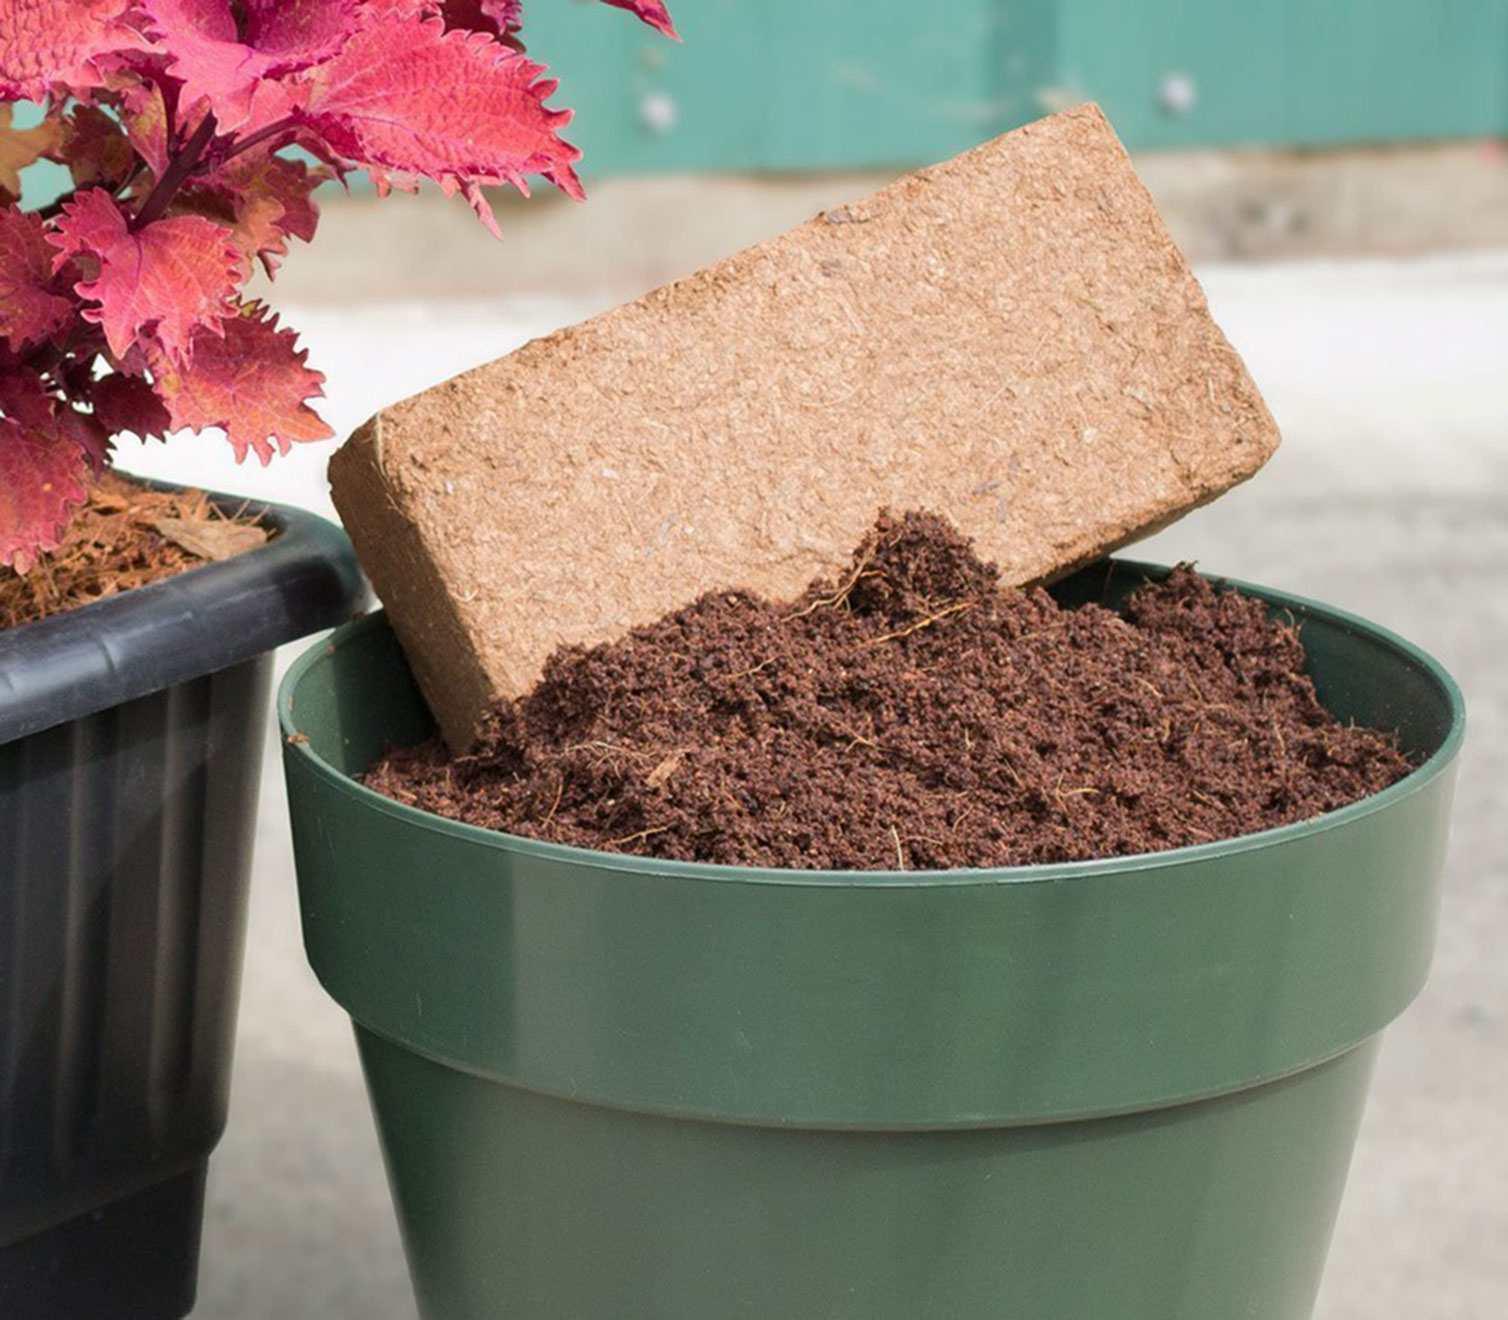 Coir brick in a pot of soil